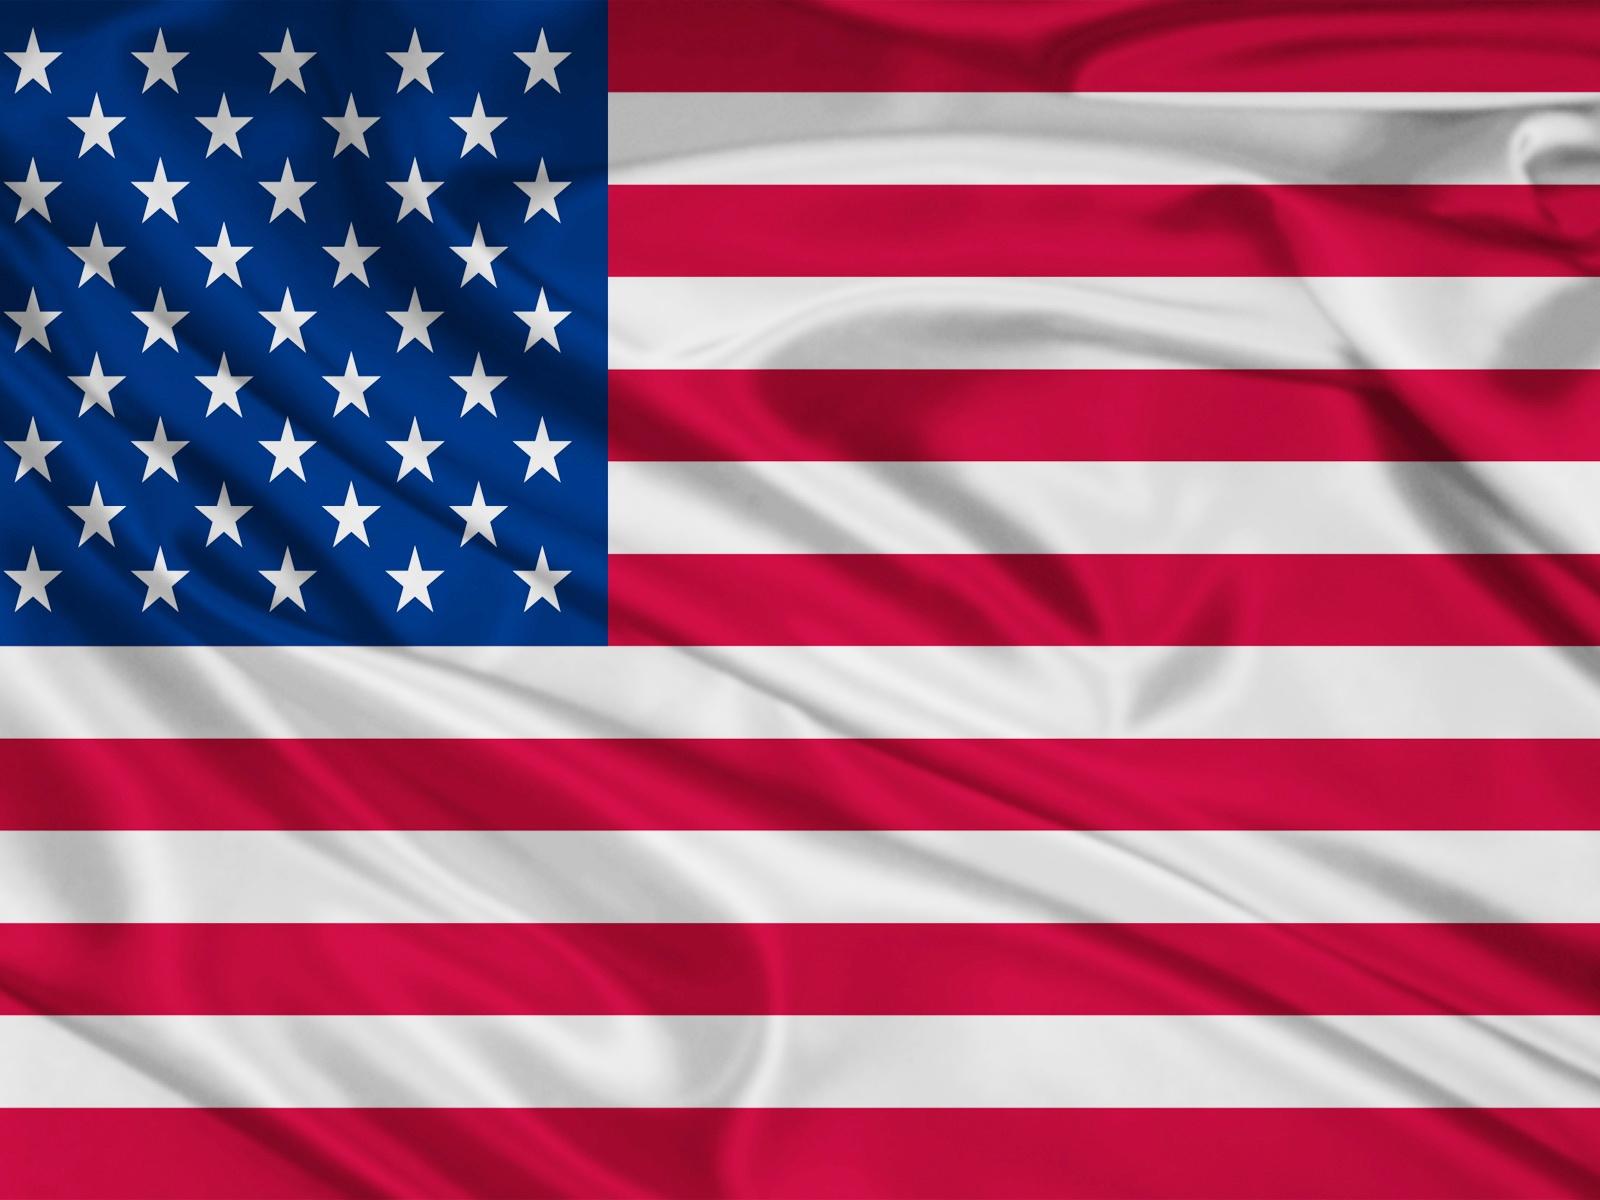 1600x1200 United States Flag desktop PC and Mac wallpaper 1600x1200